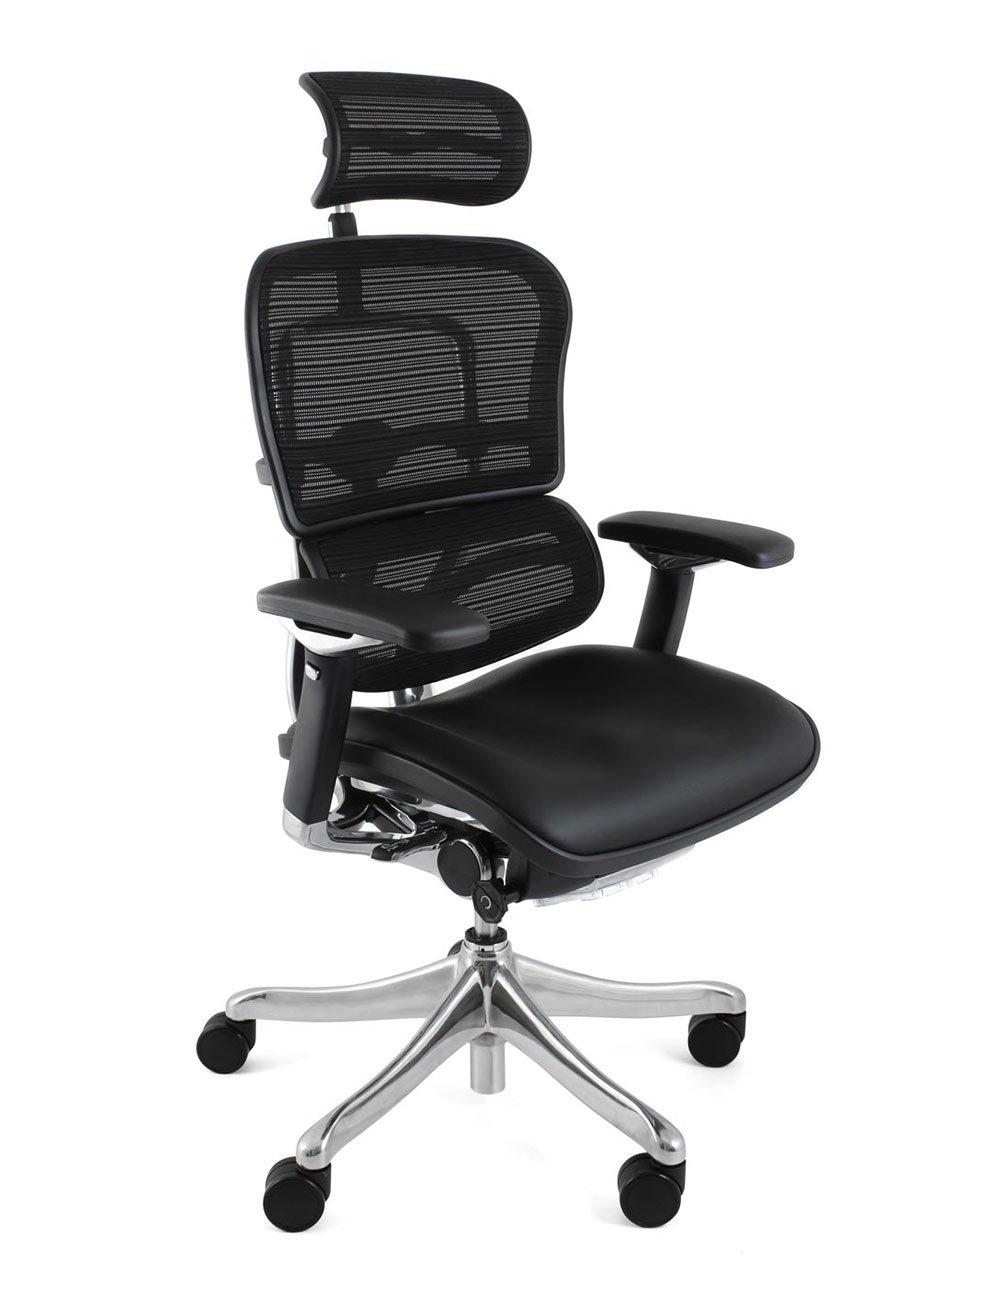 f25c6eac8c8 The Ergohuman Plus Chair - Online Ergonomics